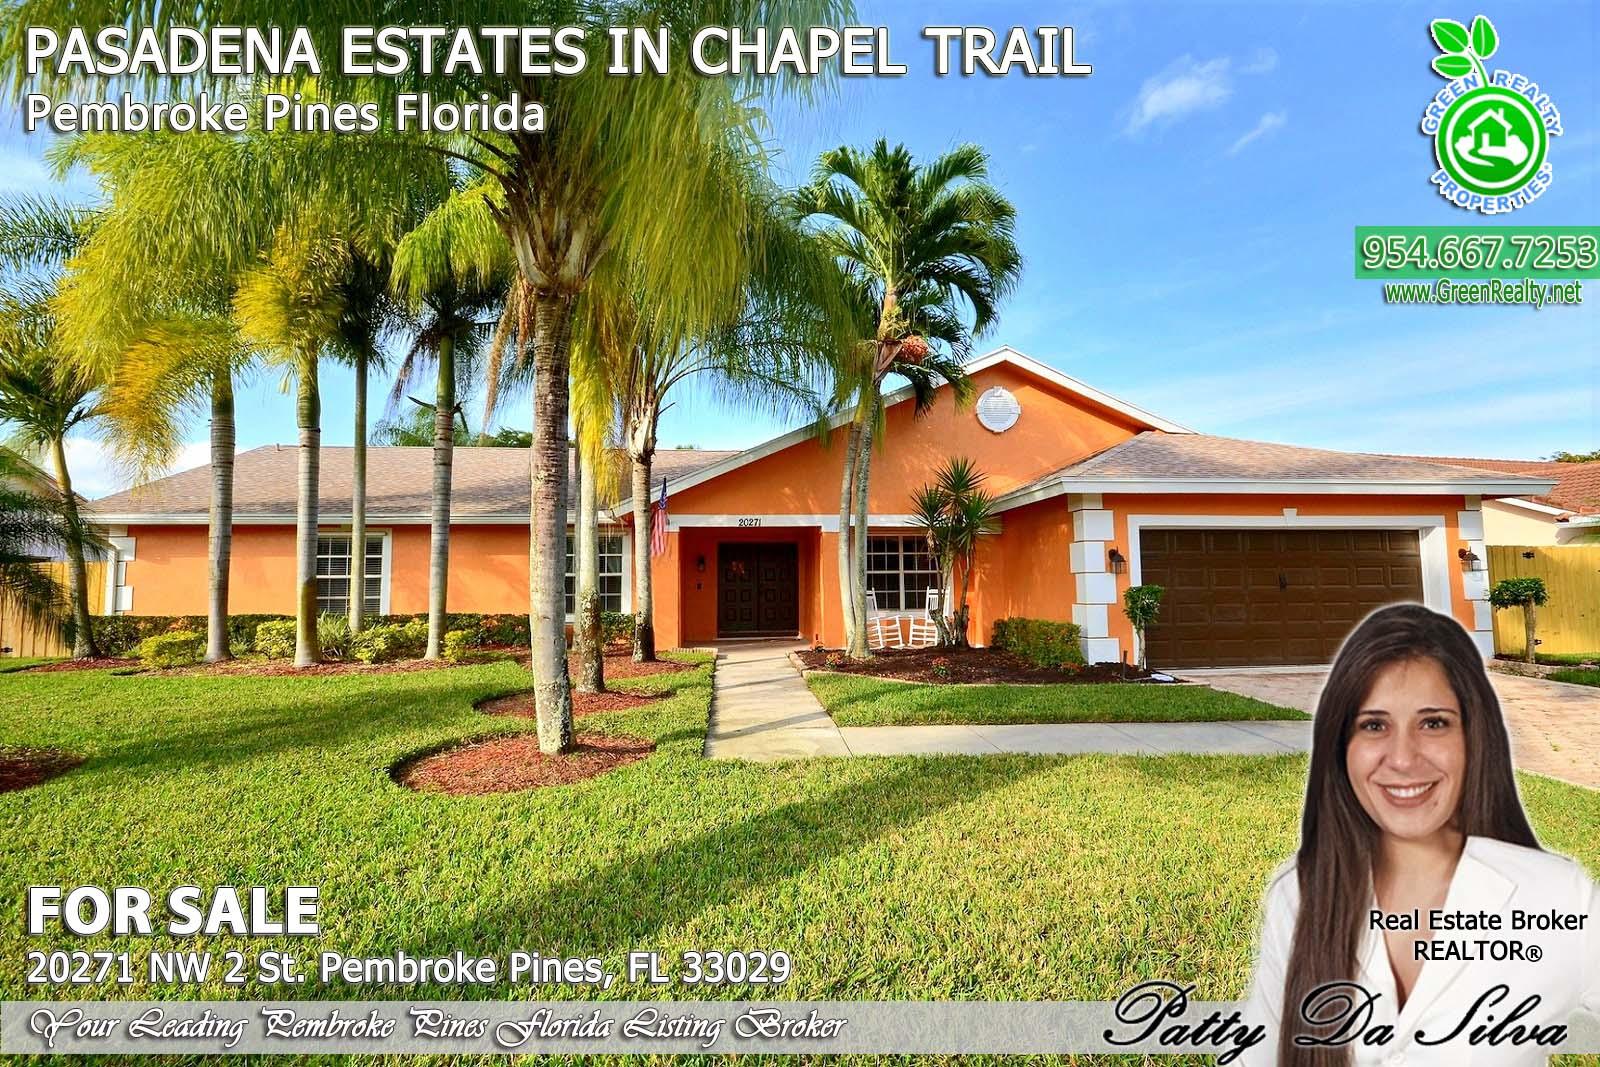 Pasadena Estates of Chapel Trail - Pembroke Pines FL Listing Agent